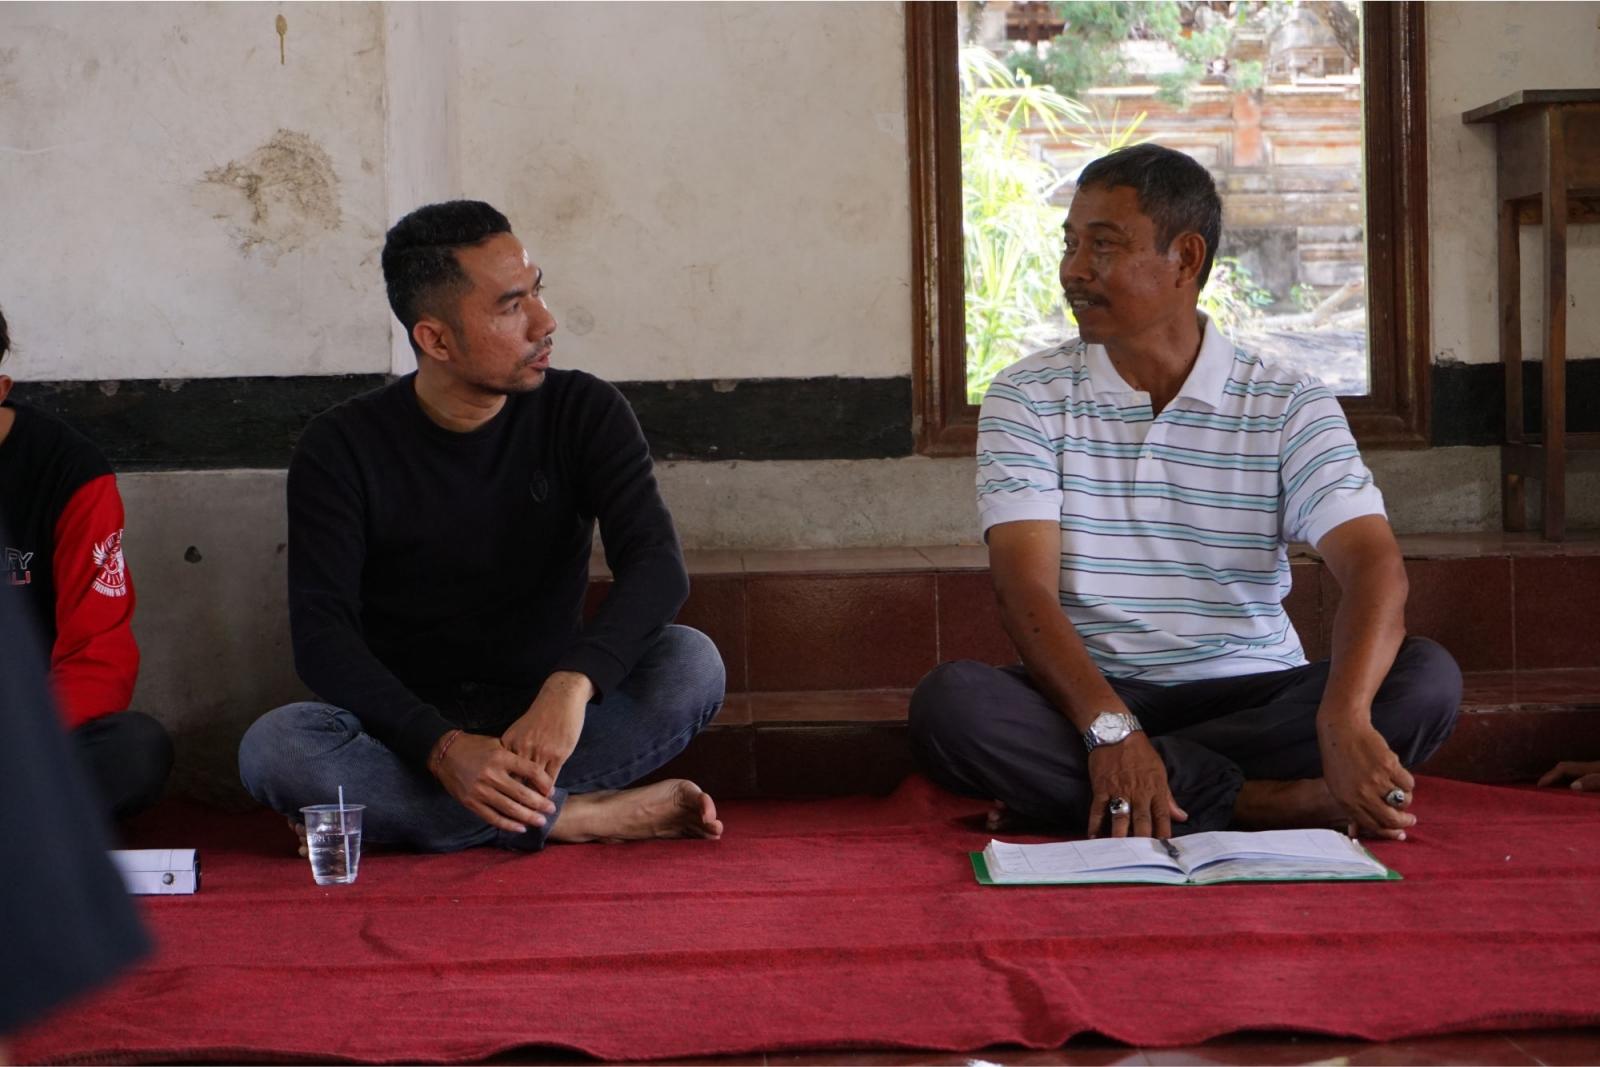 Bali Emporio Architect Team Conducts Charity Activities to Yasa Kerti Karangasem Orphanage Foundatio 2